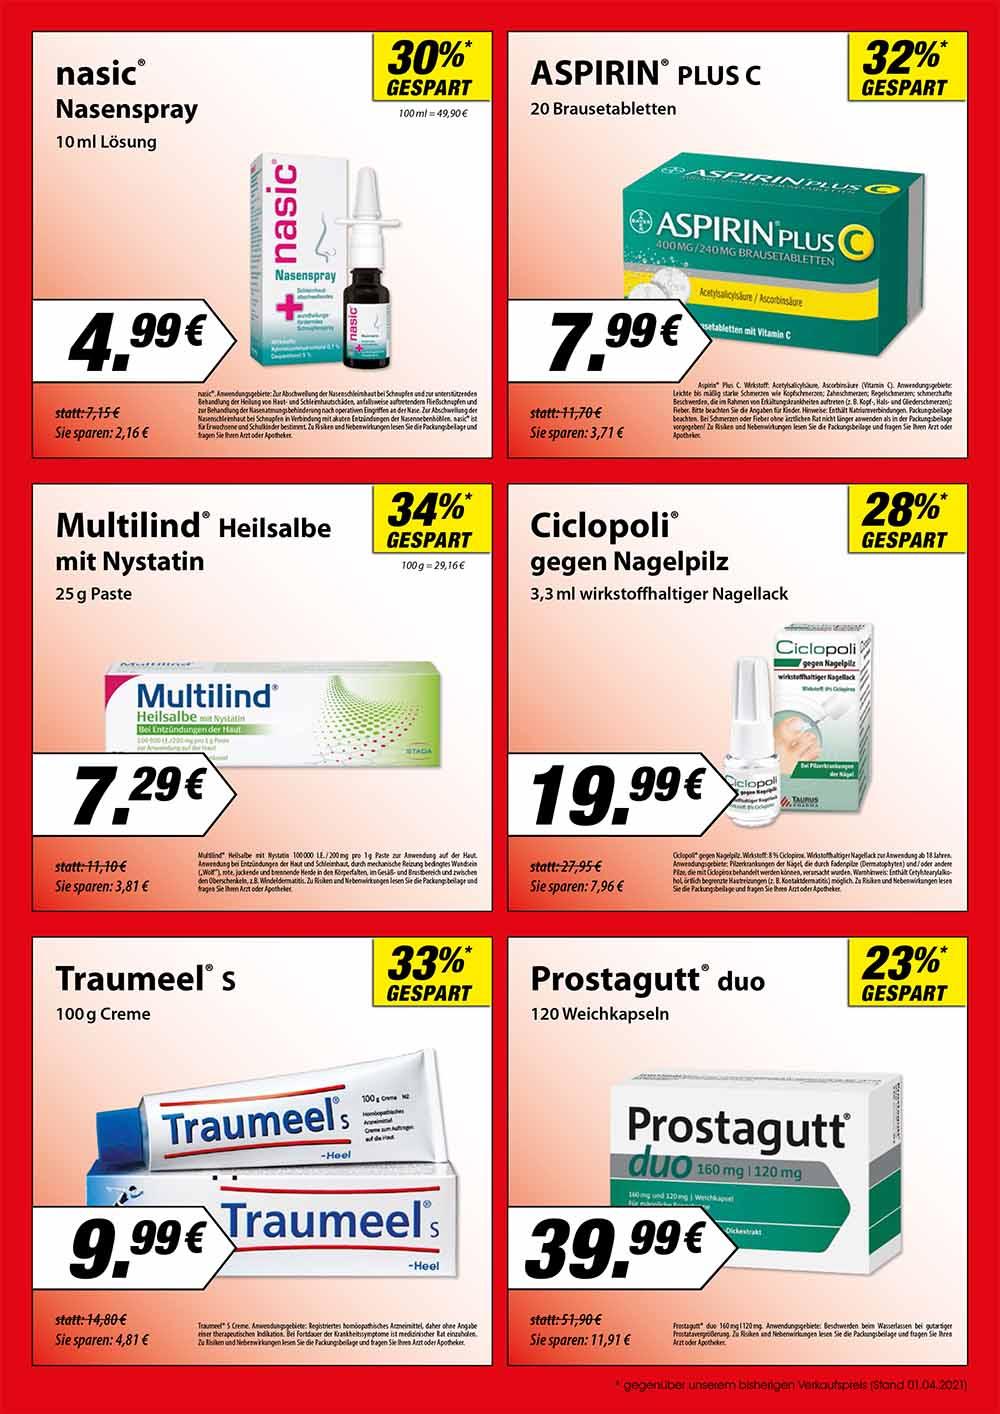 https://www-apotheken-de.apocdn.net/fileadmin/clubarea/00000-Angebote/35232_11932_am_huenstein_angebot_3.jpg